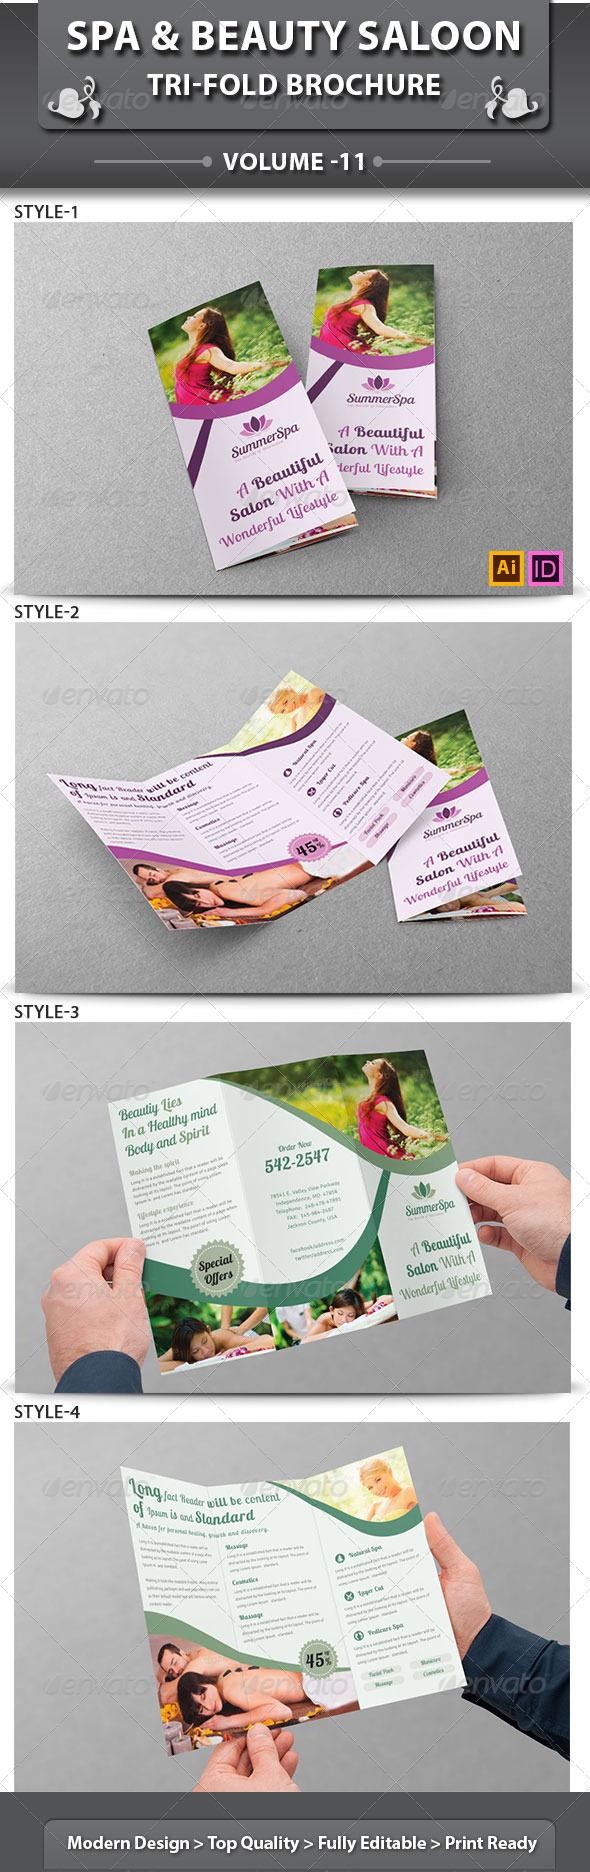 GraphicRiver Spa & Beauty Saloon Tri-Fold Brochure Volume 11 6568045